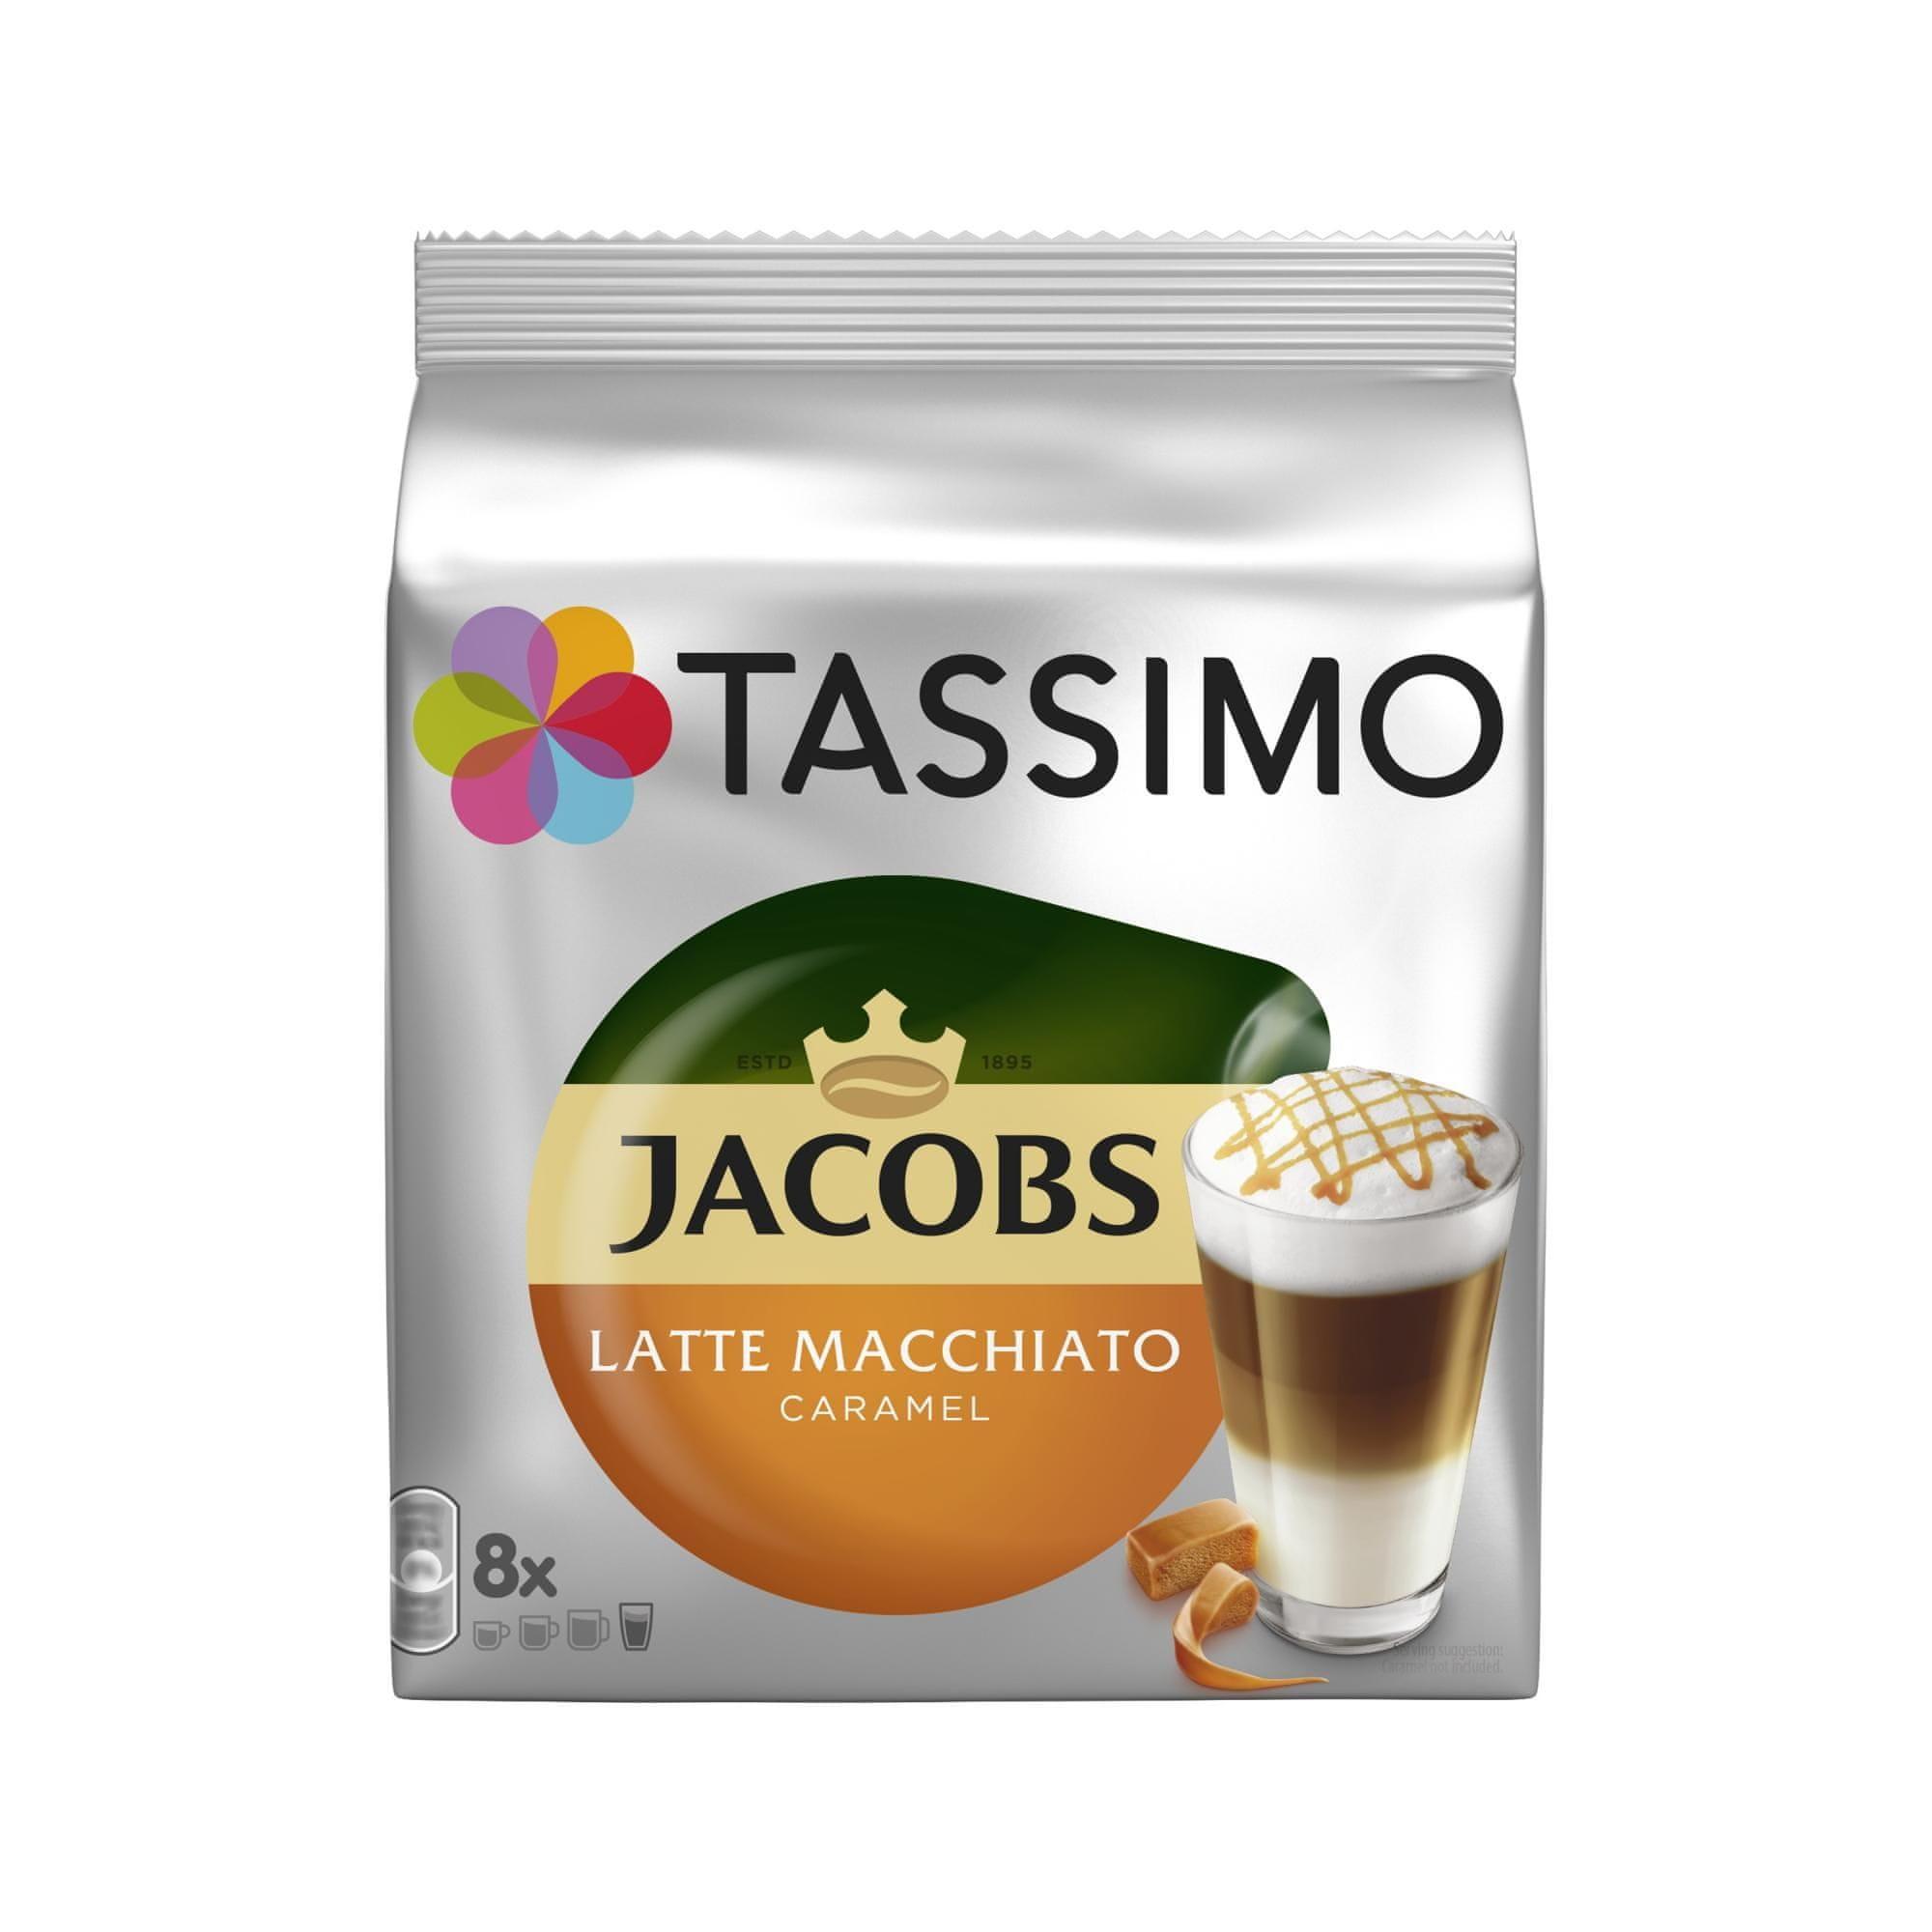 dolce gusto latte macchiato caramel how to make